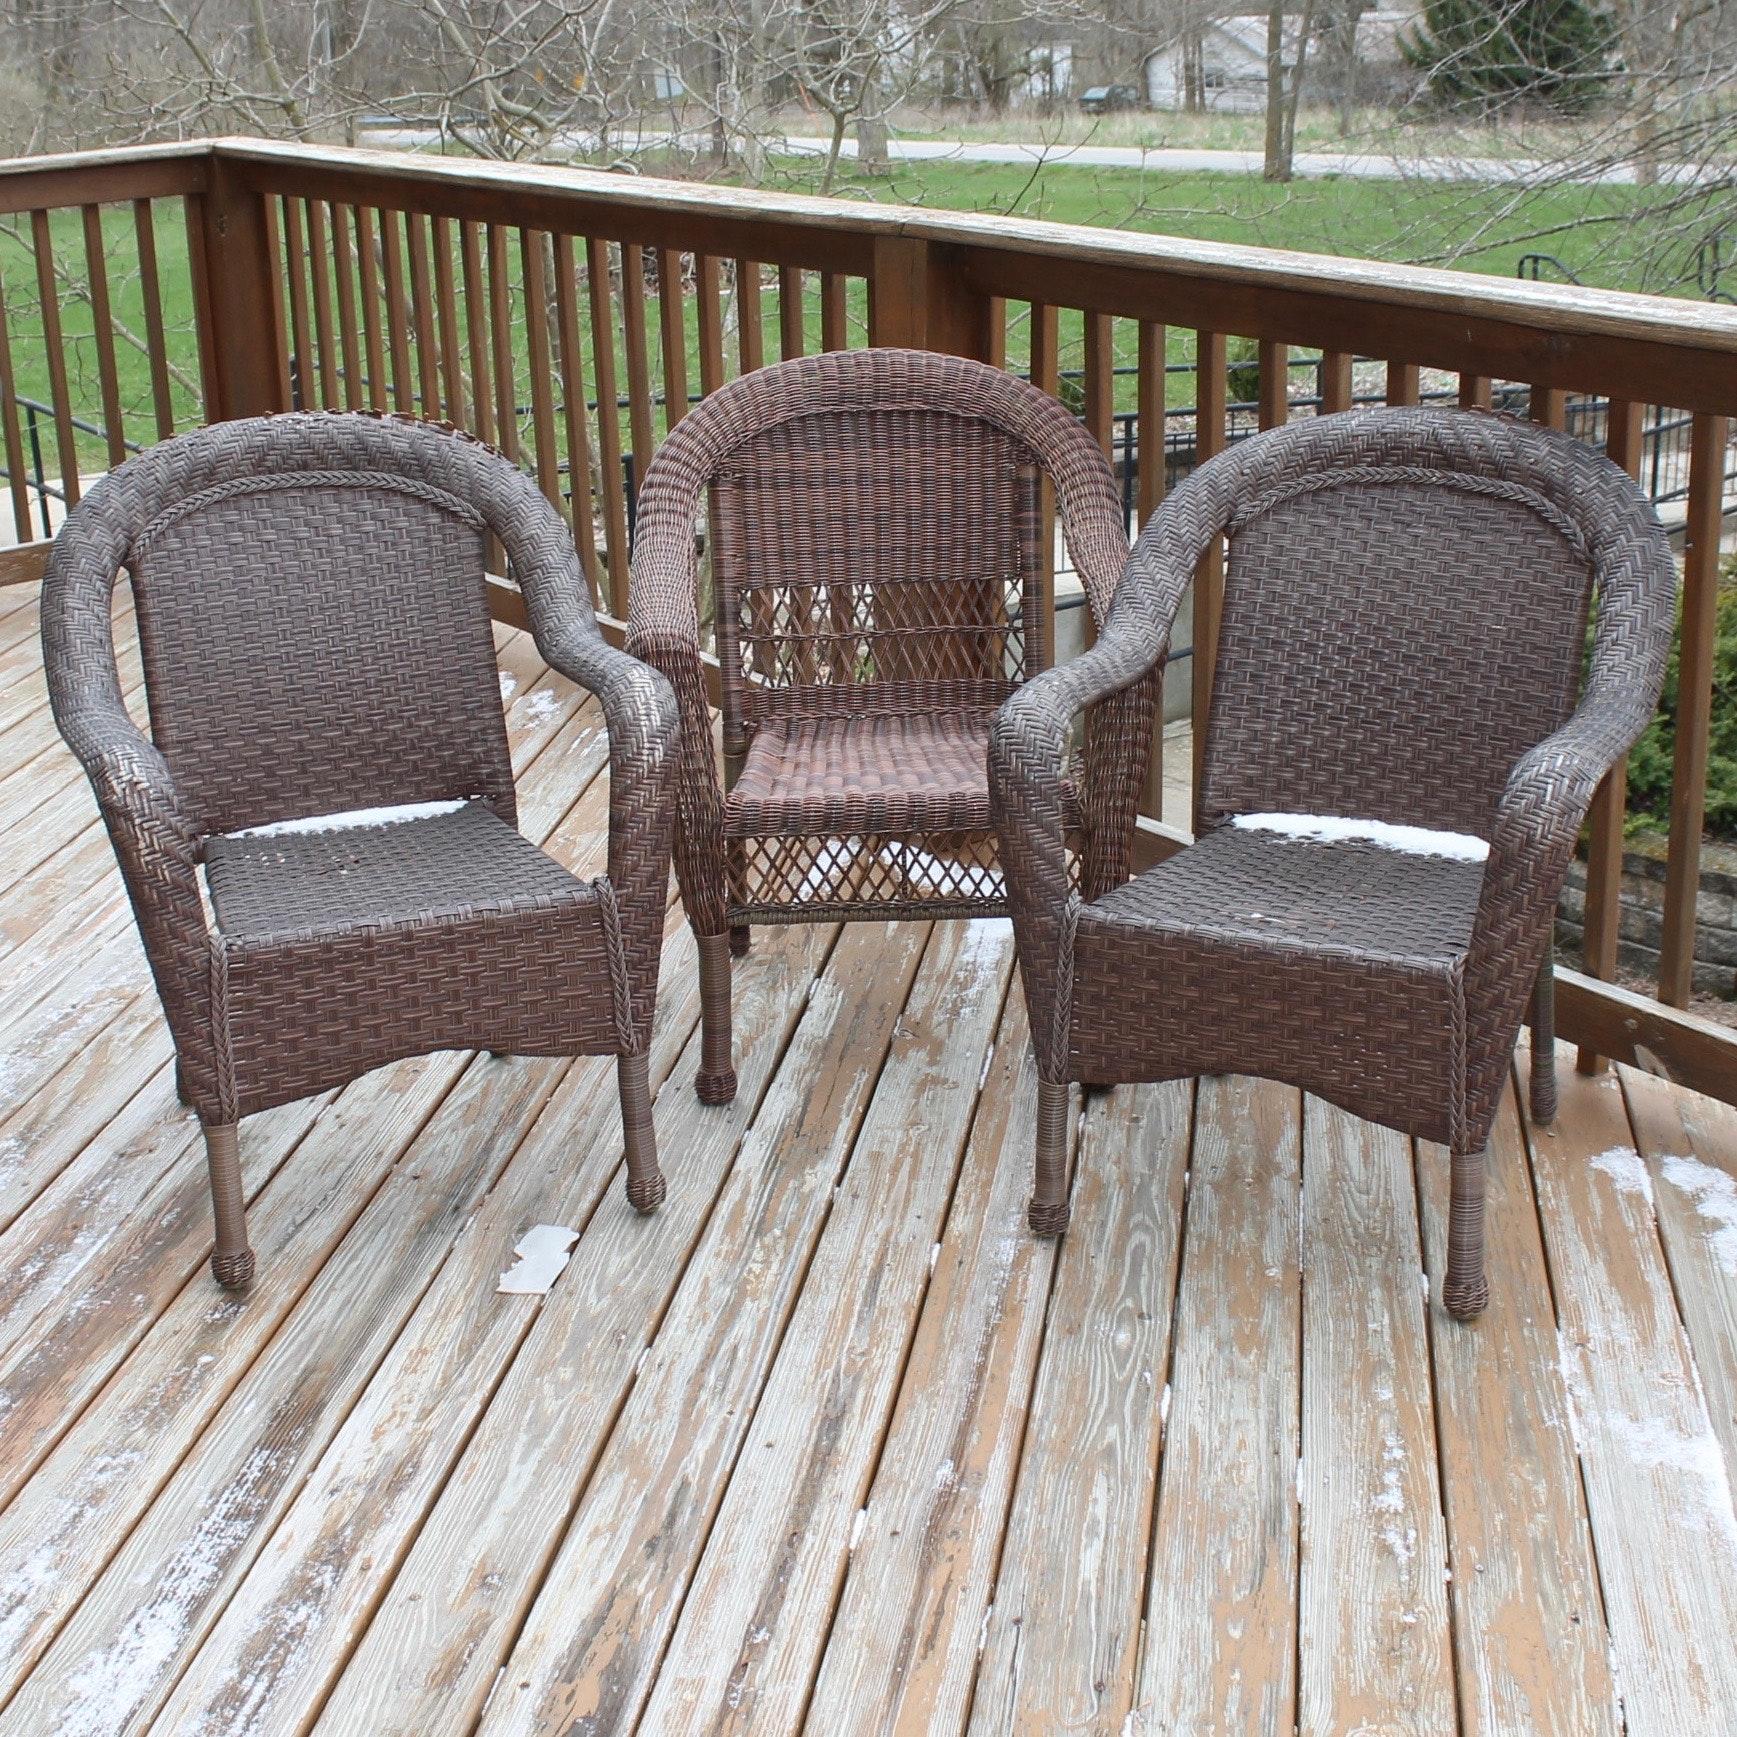 Wicker Patio Chair Grouping